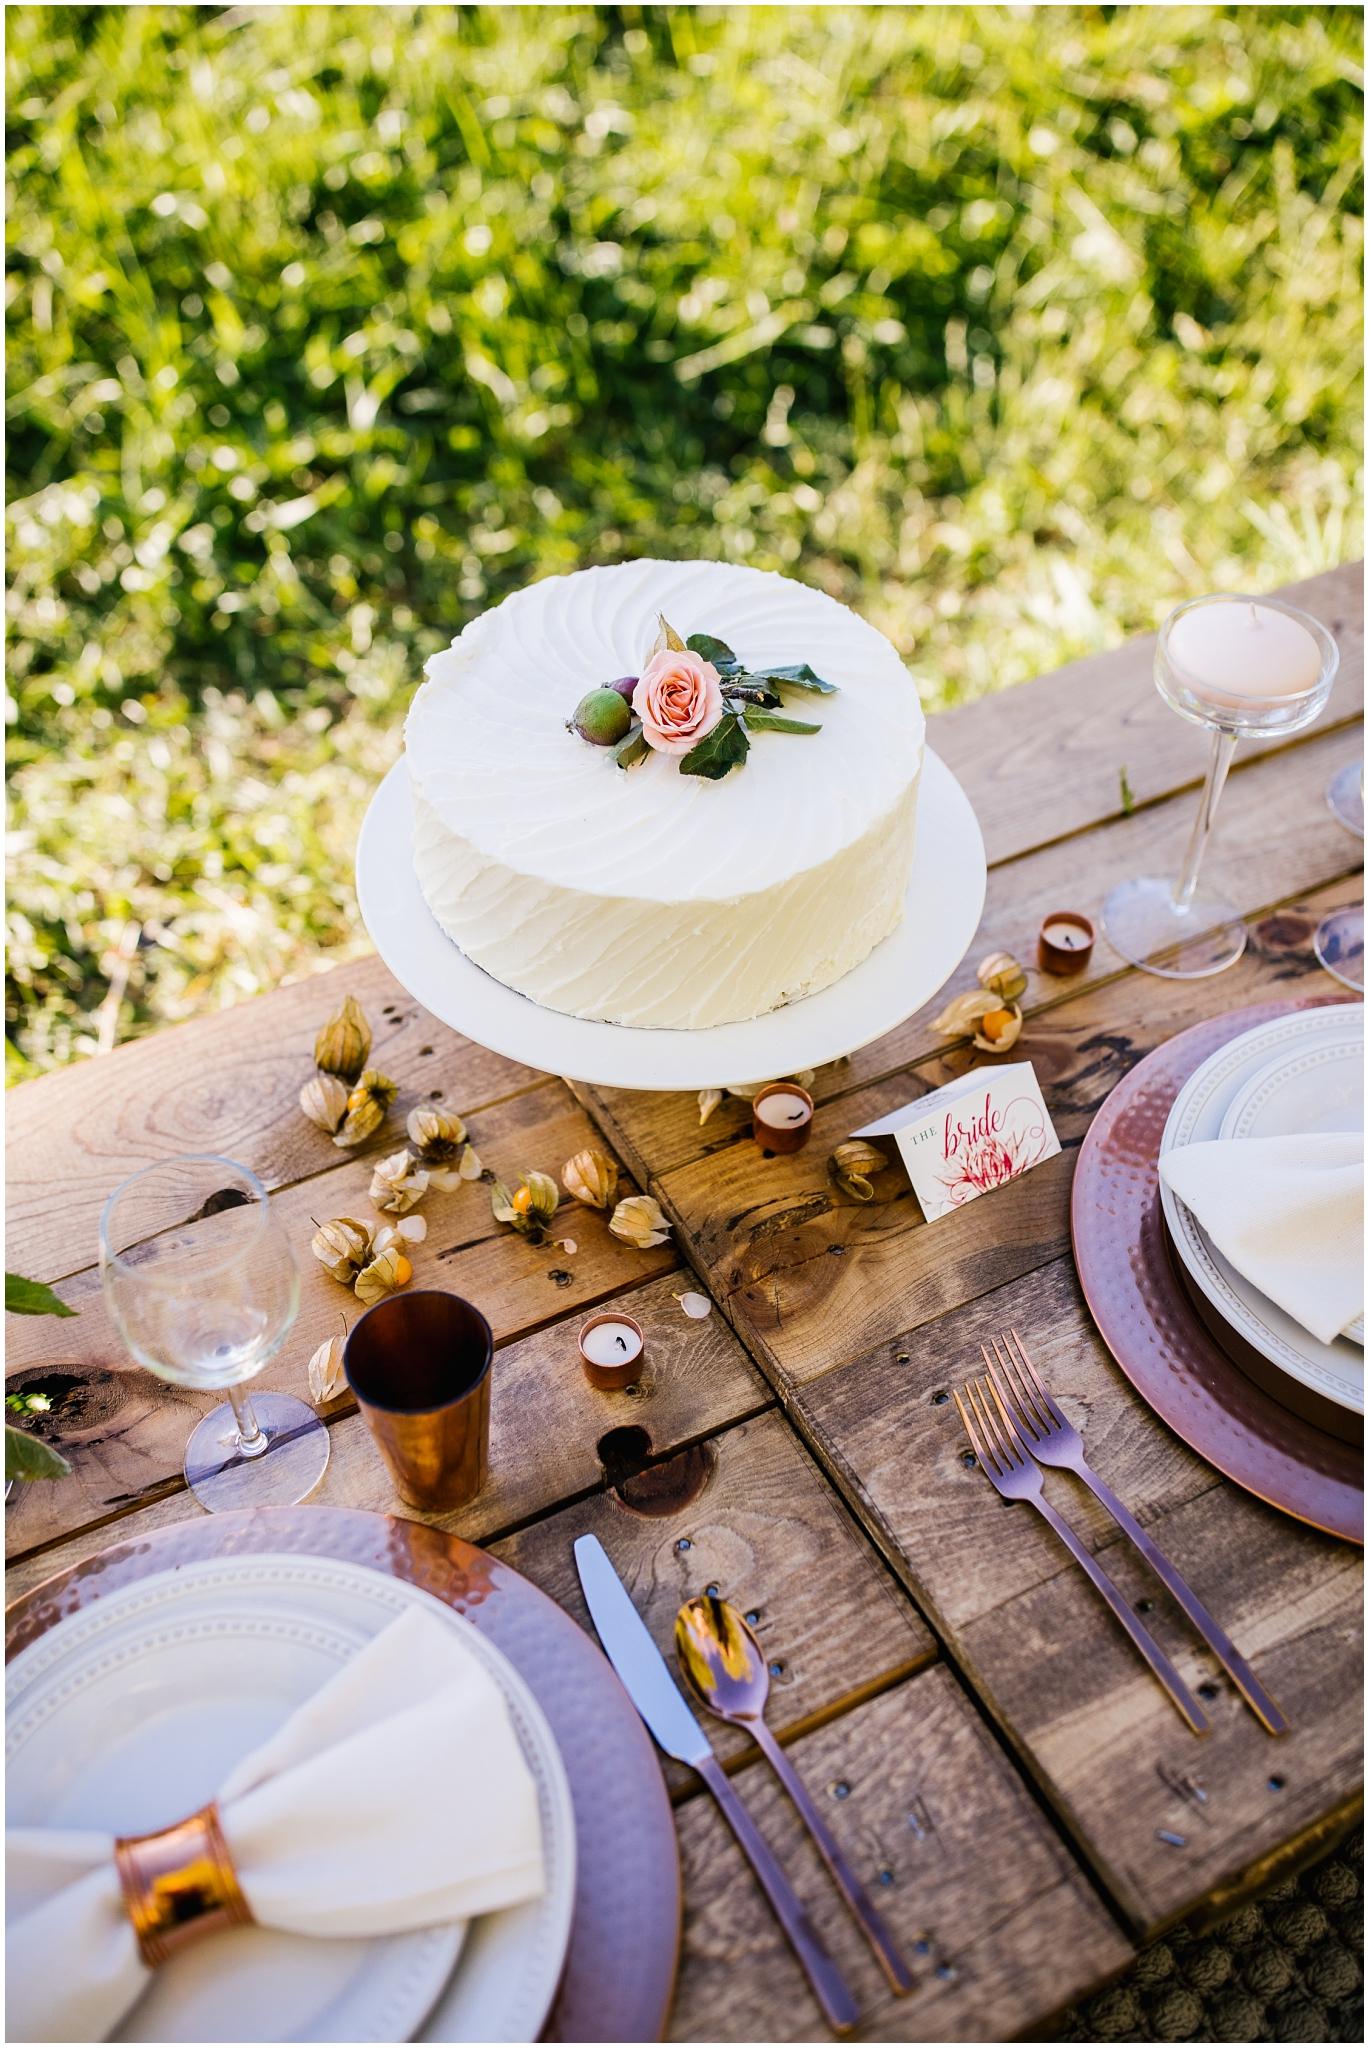 LakeShoot-5_Lizzie-B-Imagery-Utah-Wedding-Photographer-Salt-Lake-City-Park-City-Oakley.jpg